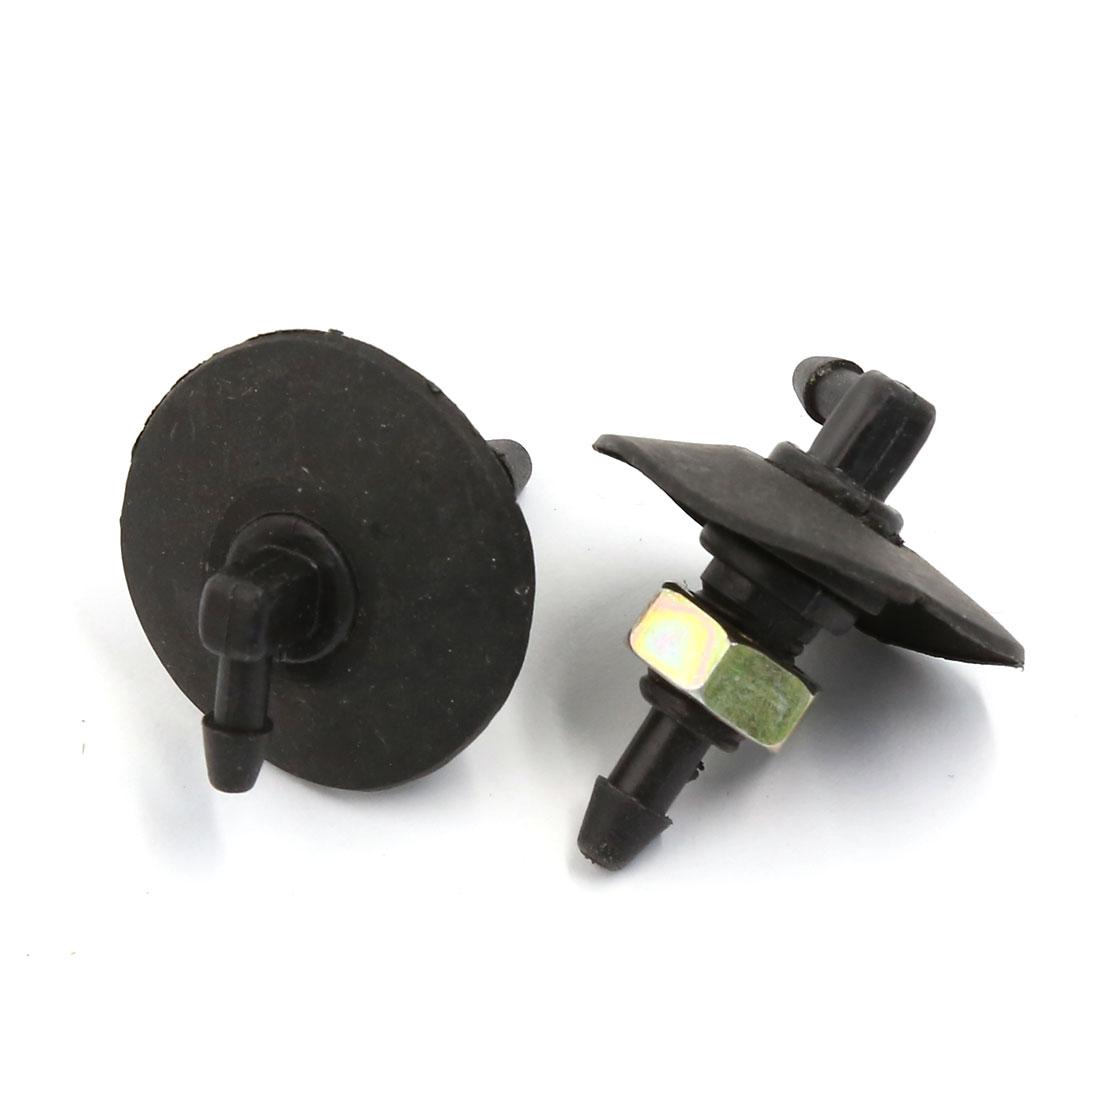 Universal Car Window Wiper Cleaner Sprayer Windshield Washer Nozzle 9mm Pair